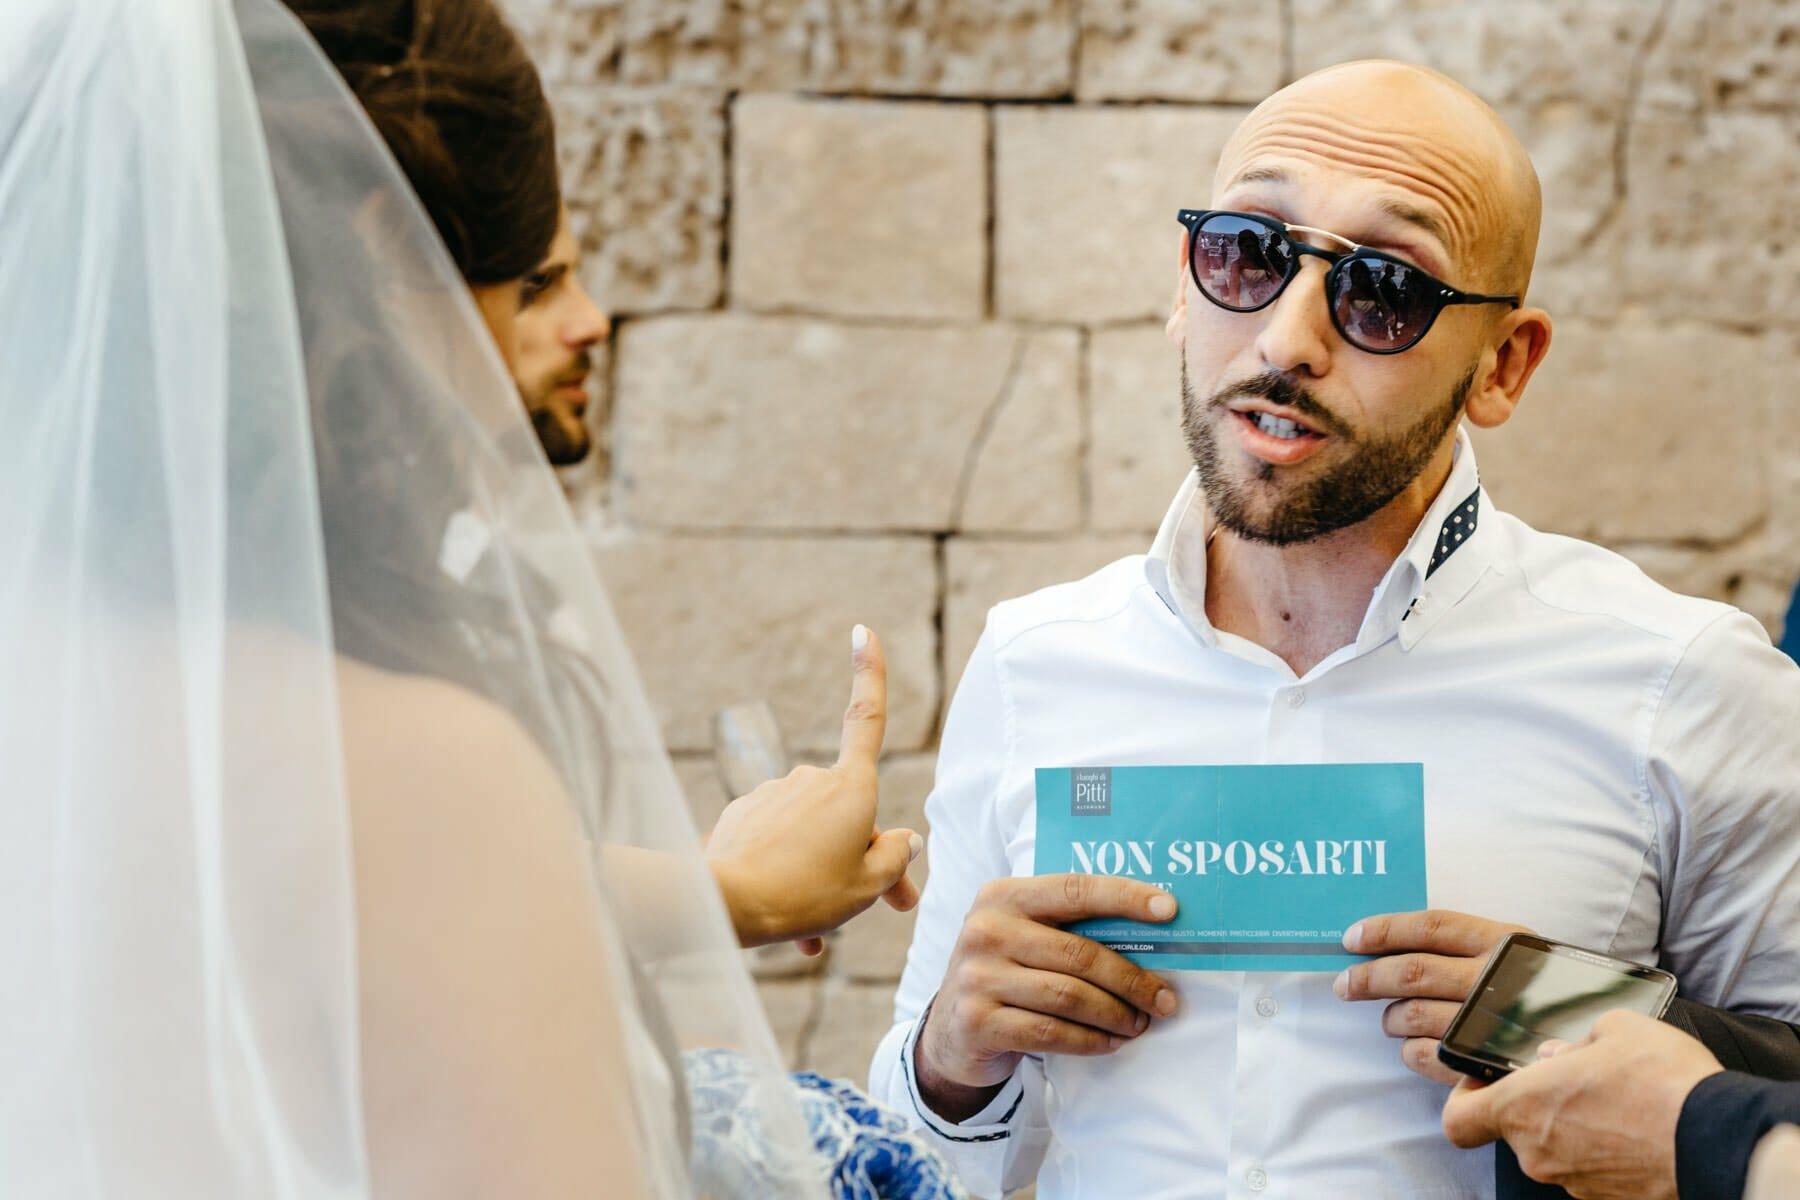 matera-italia-portfolio-wedding-fotografo-masseria-bonelli-puglia-pietro-moliterni-28